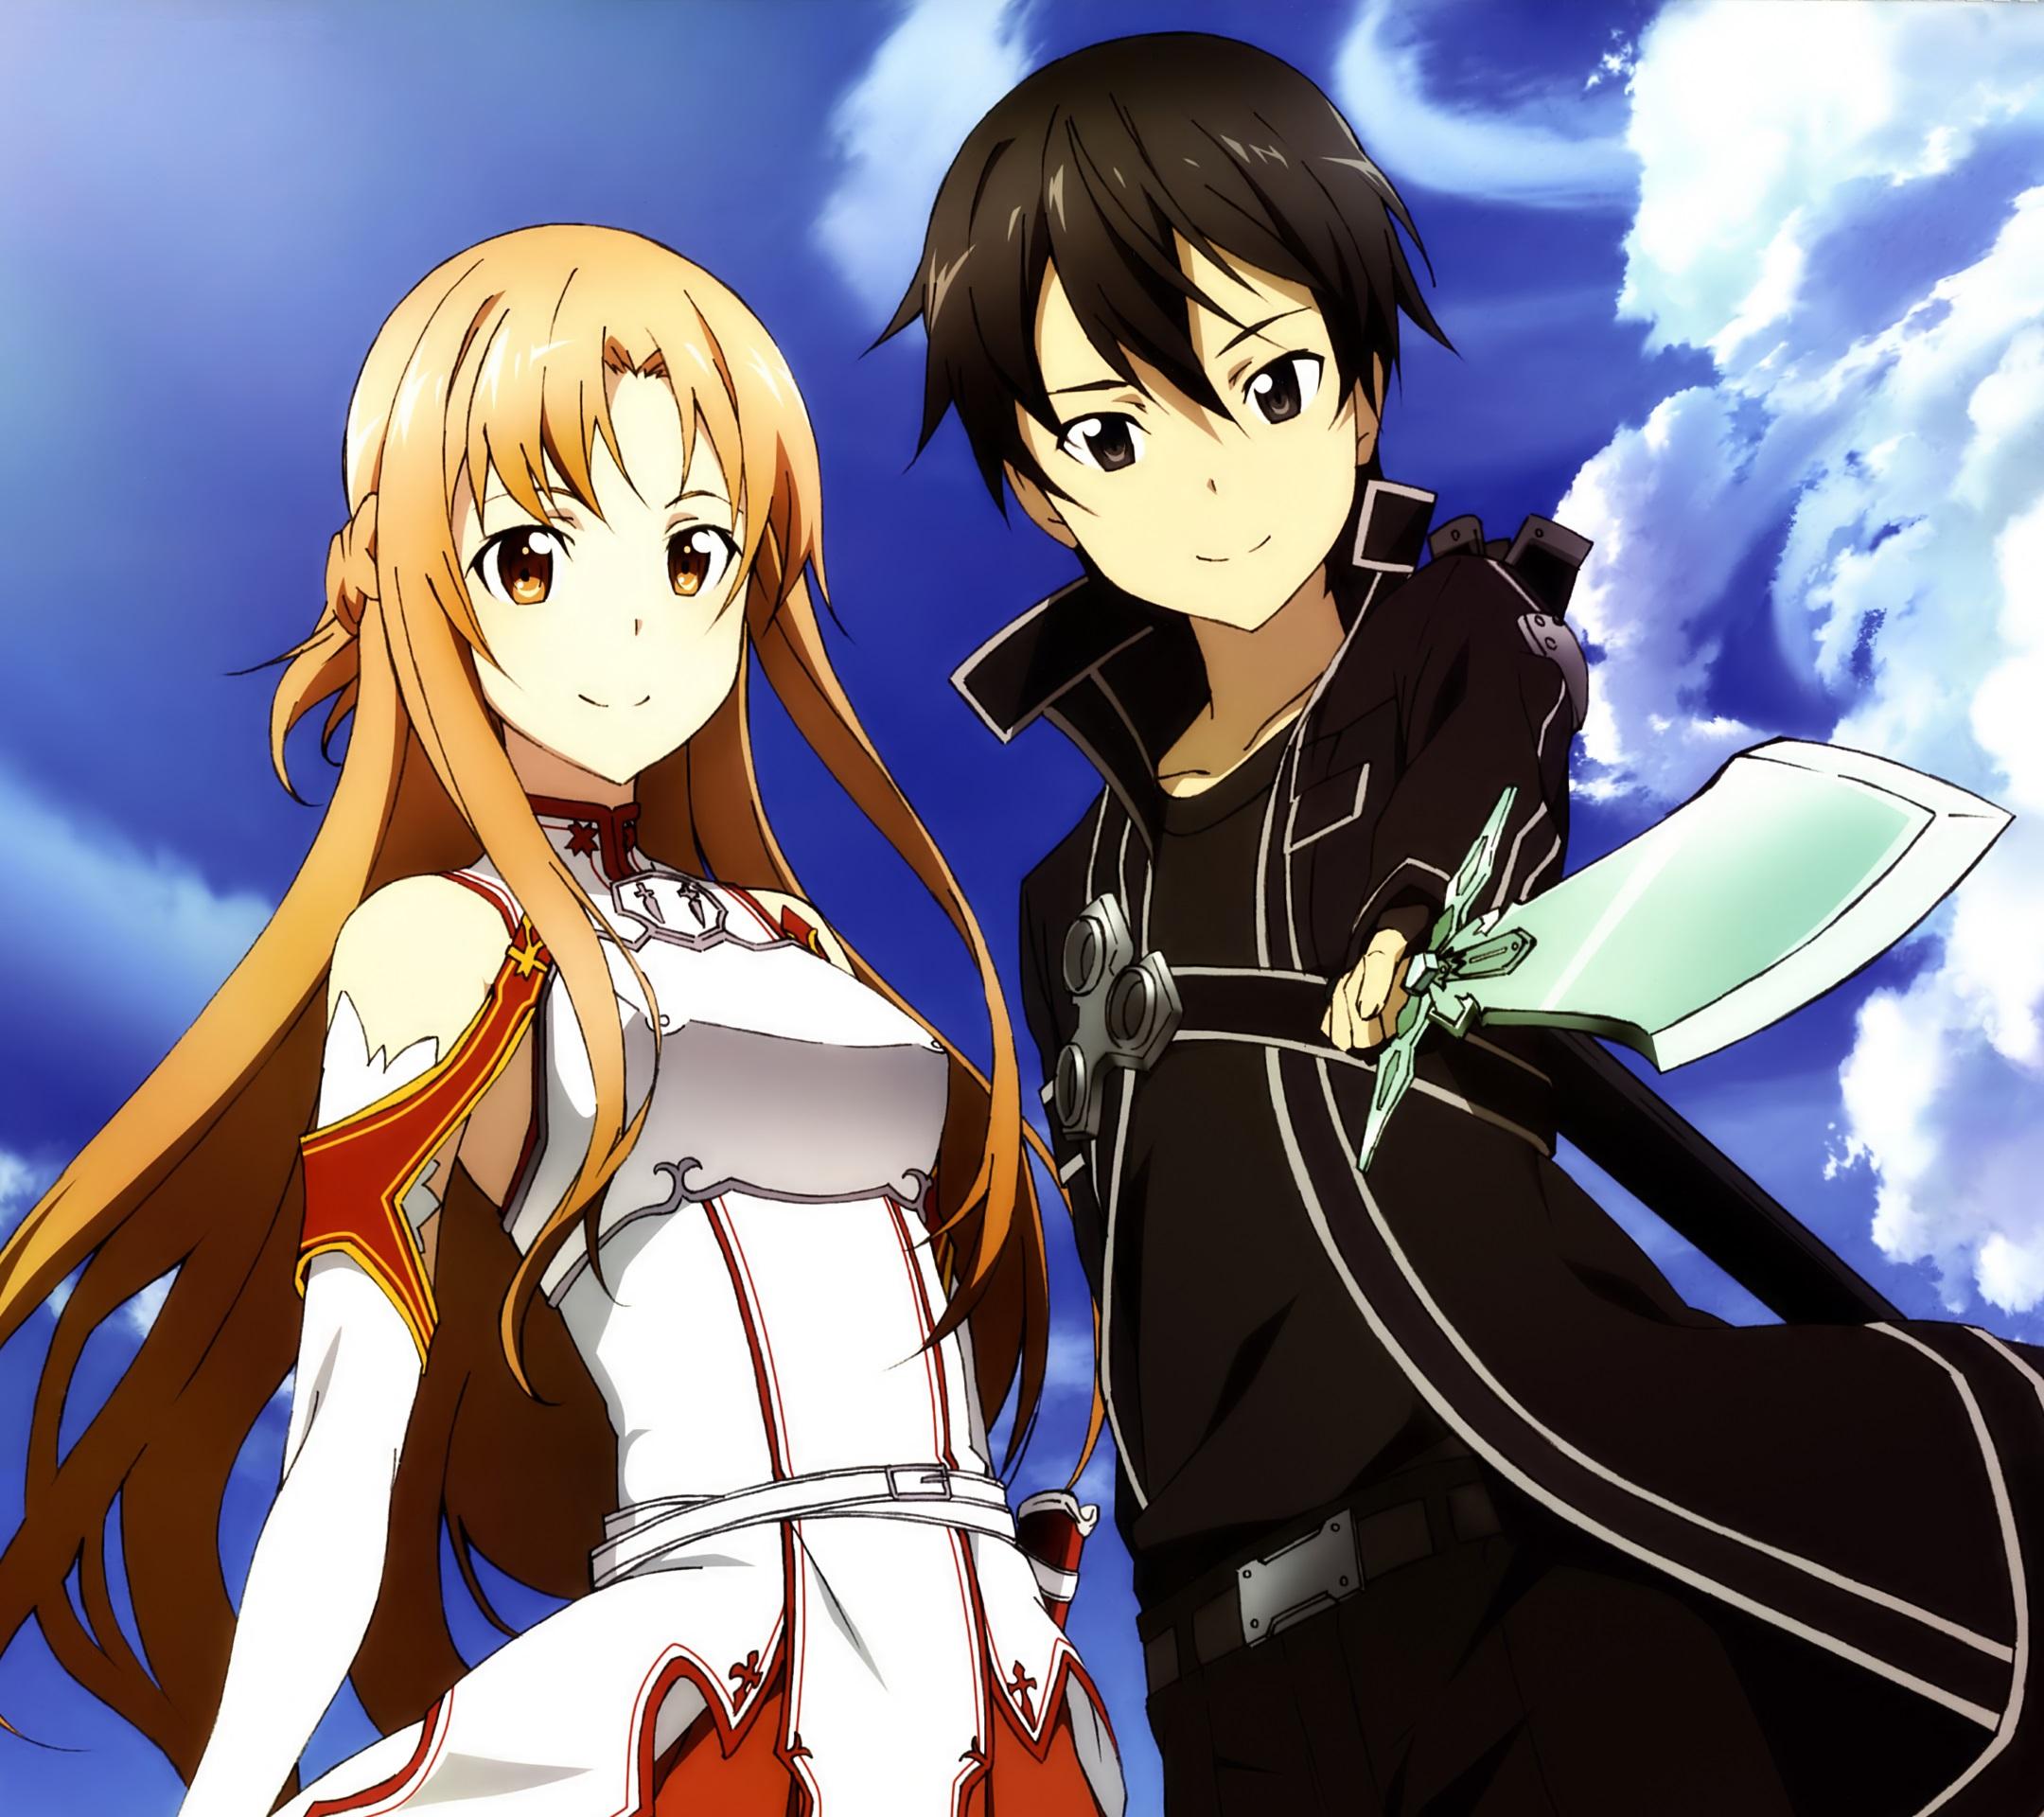 Sword Art Online 2 Kirito AsunaAndroid Wallpaper 2160x1920